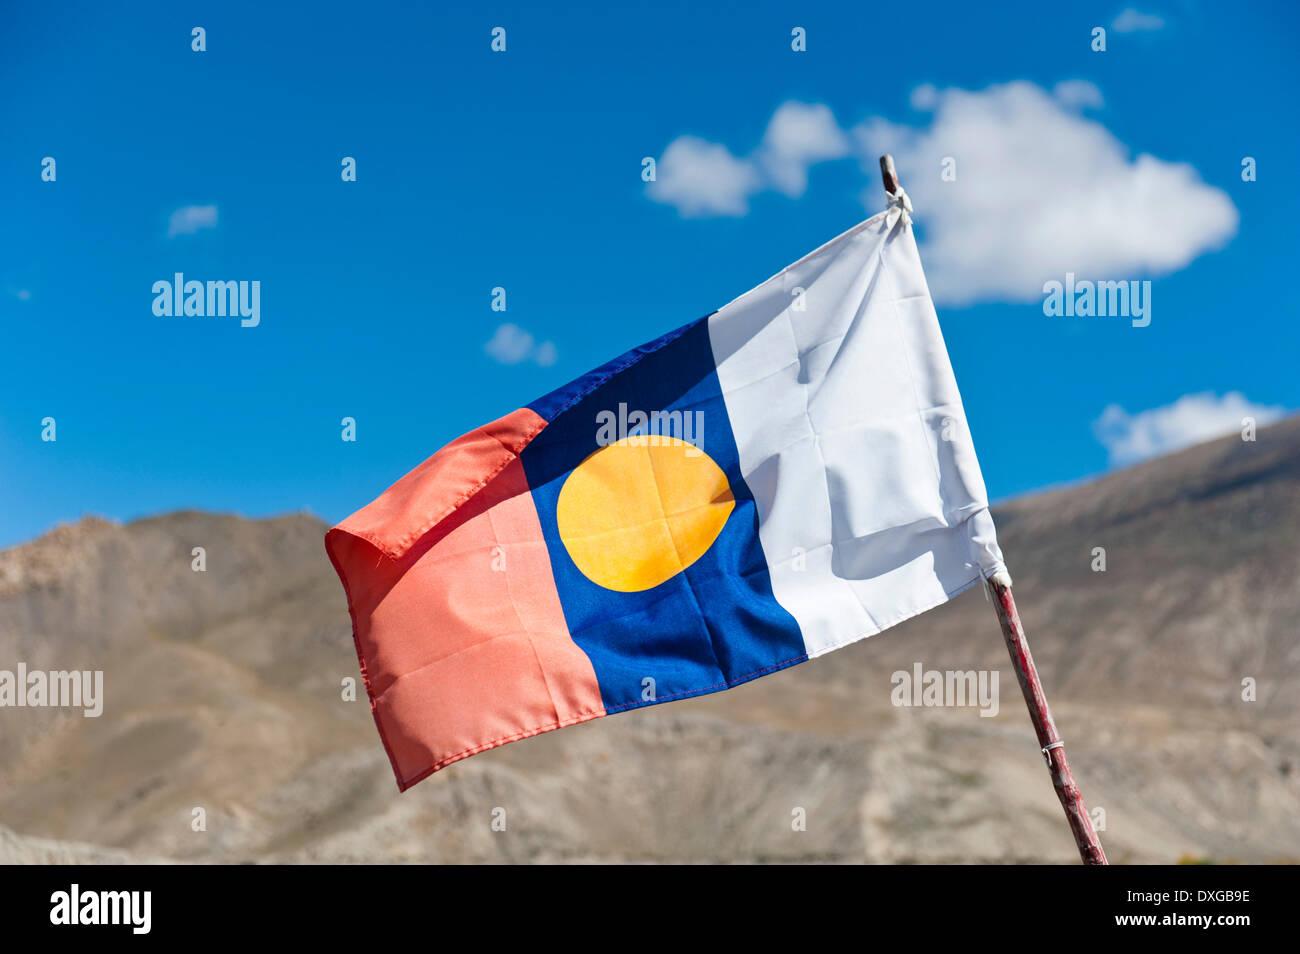 Buddhist flag, Lower Mustang, Himalayas, Nepal - Stock Image